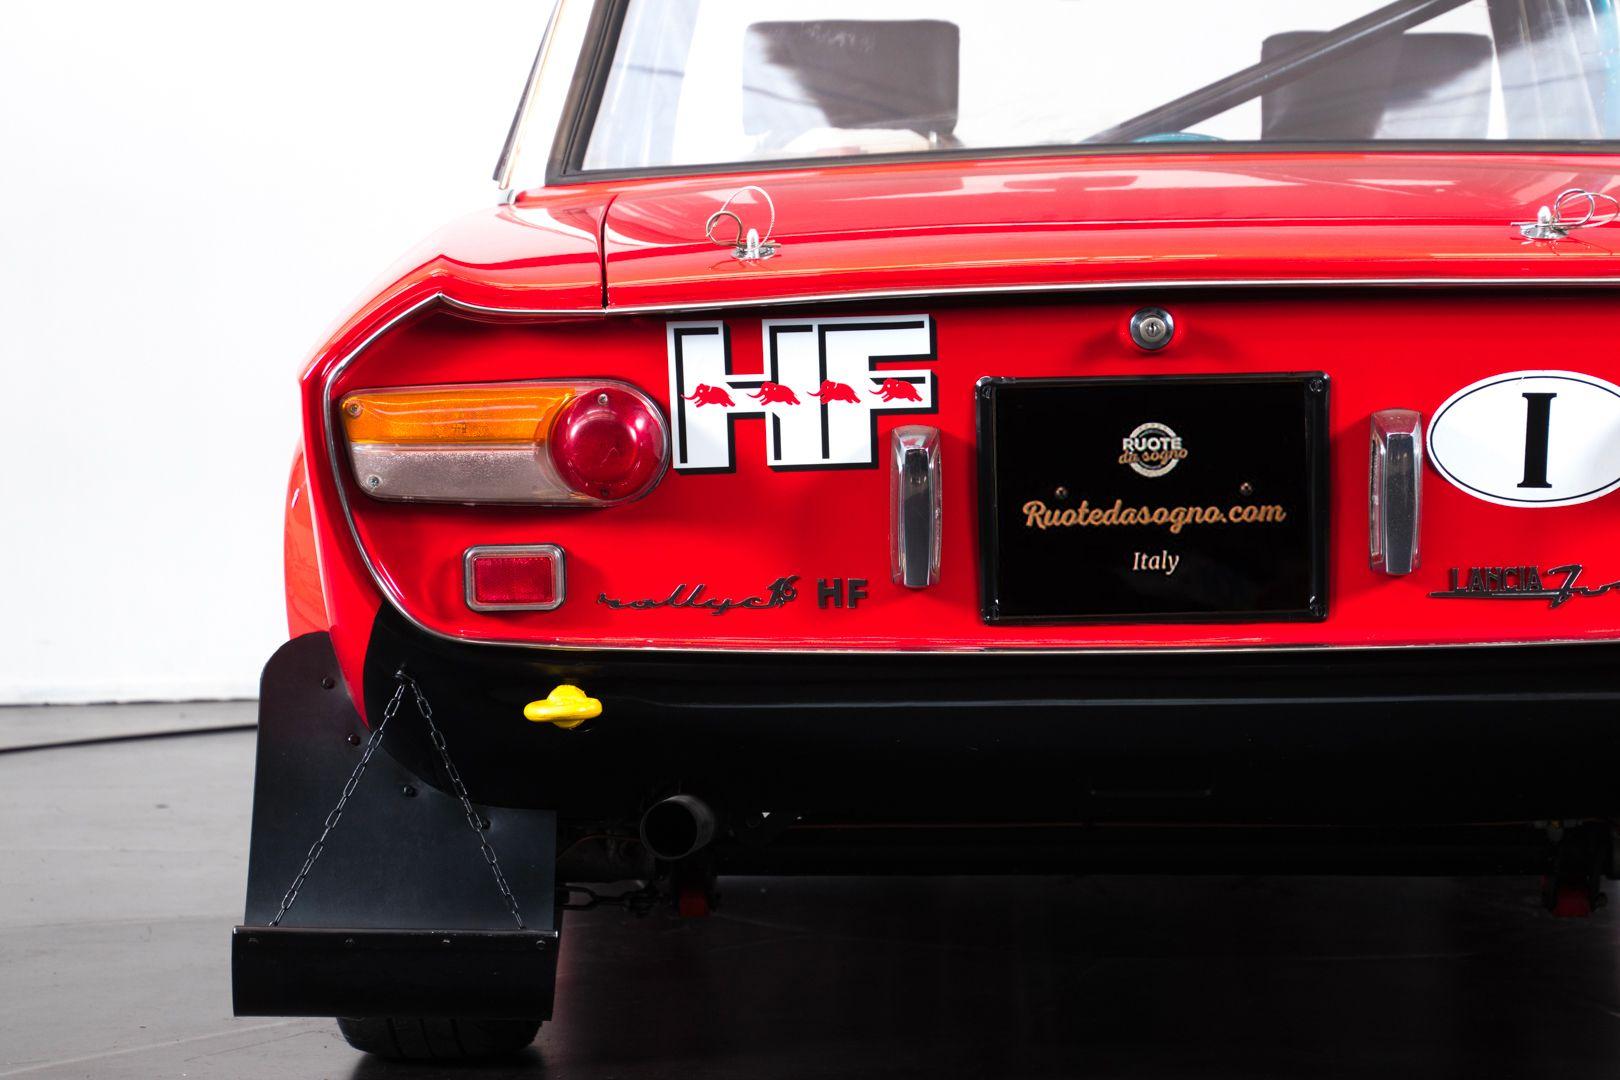 1970 Lancia Fulvia HF 1.6 - Gruppo 4 18815